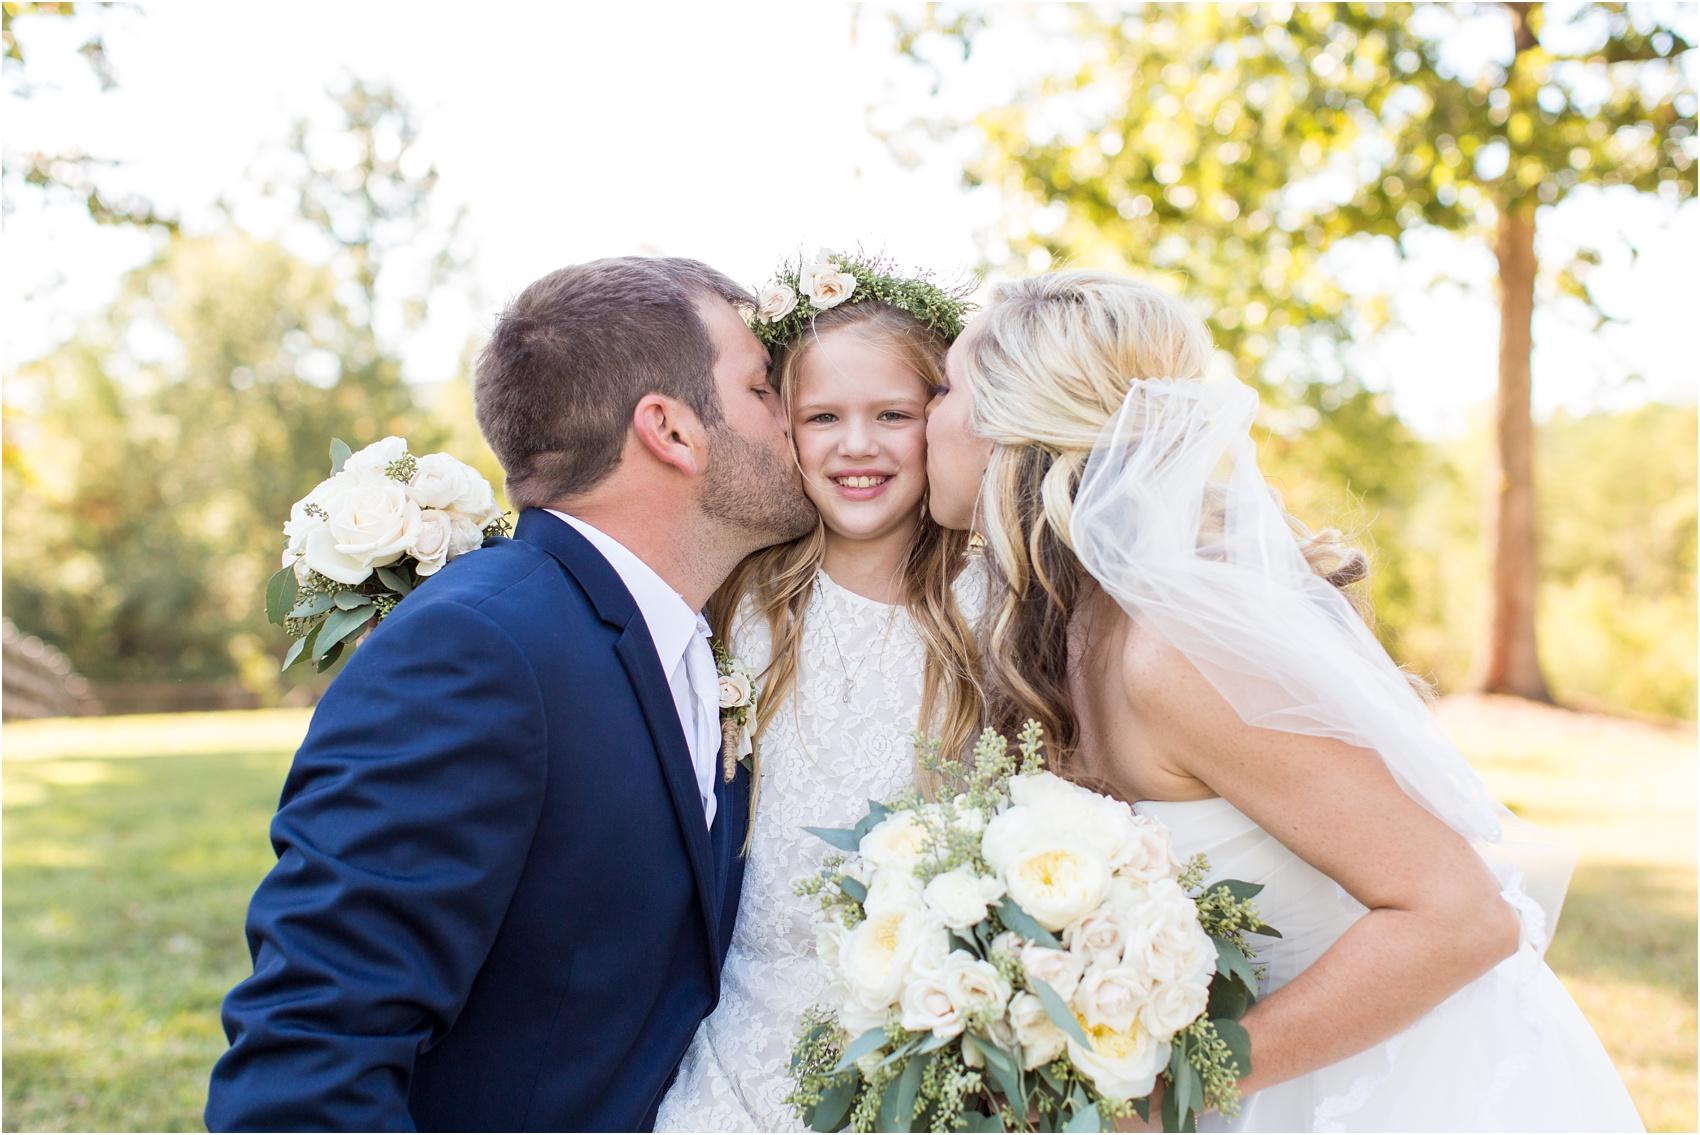 Savannah Eve Photography- Spencer Wedding- Blog-17.jpg